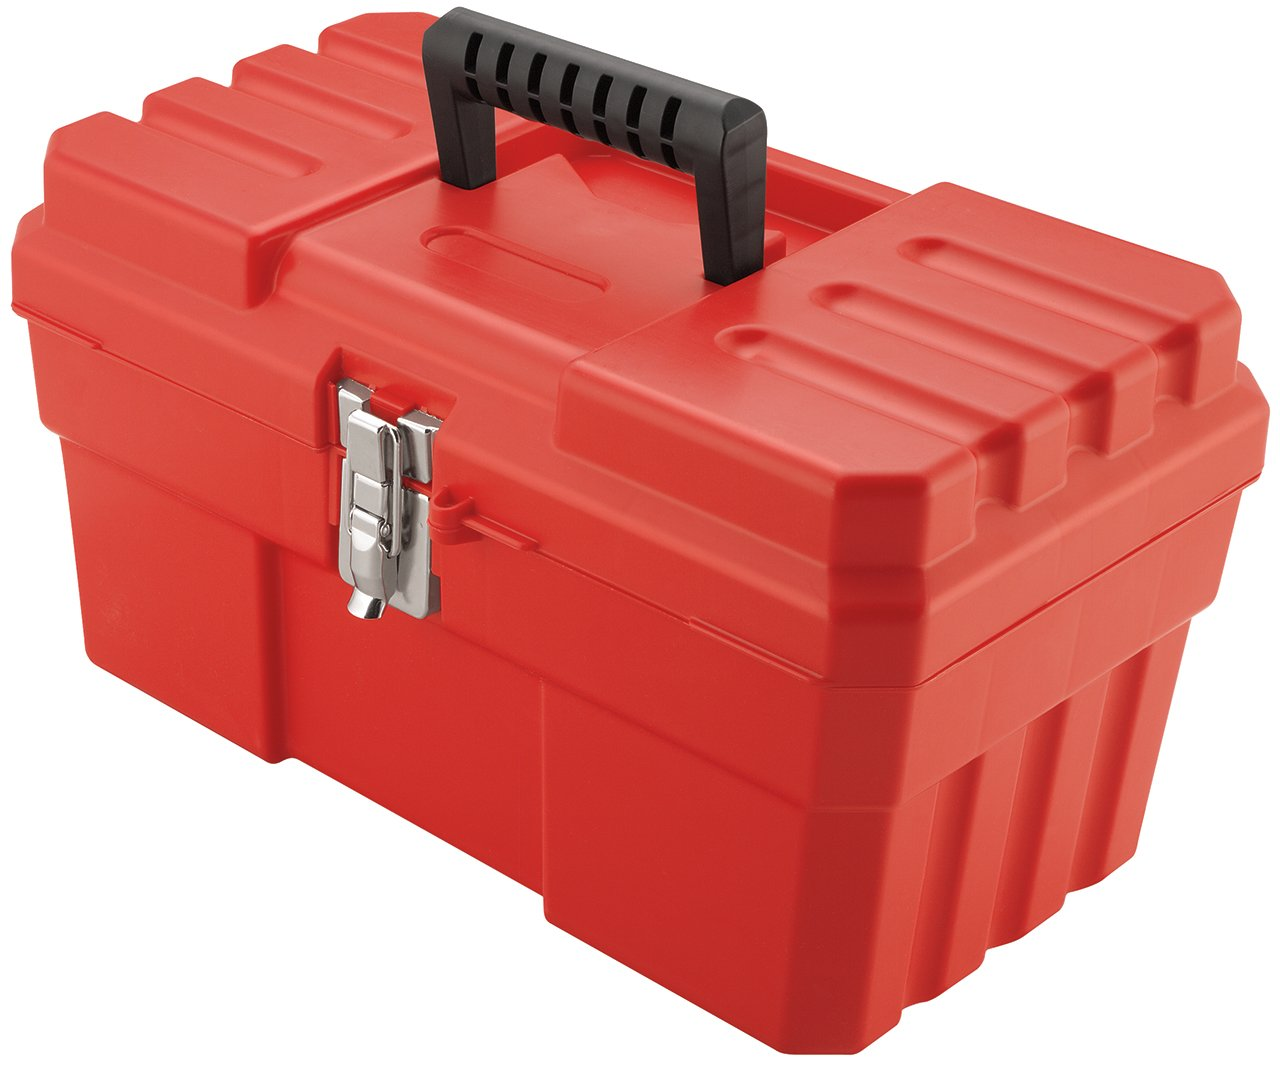 Akro-Mils 9514 14-Inch ProBox Plastic Tool Box, Red by Akro-Mils